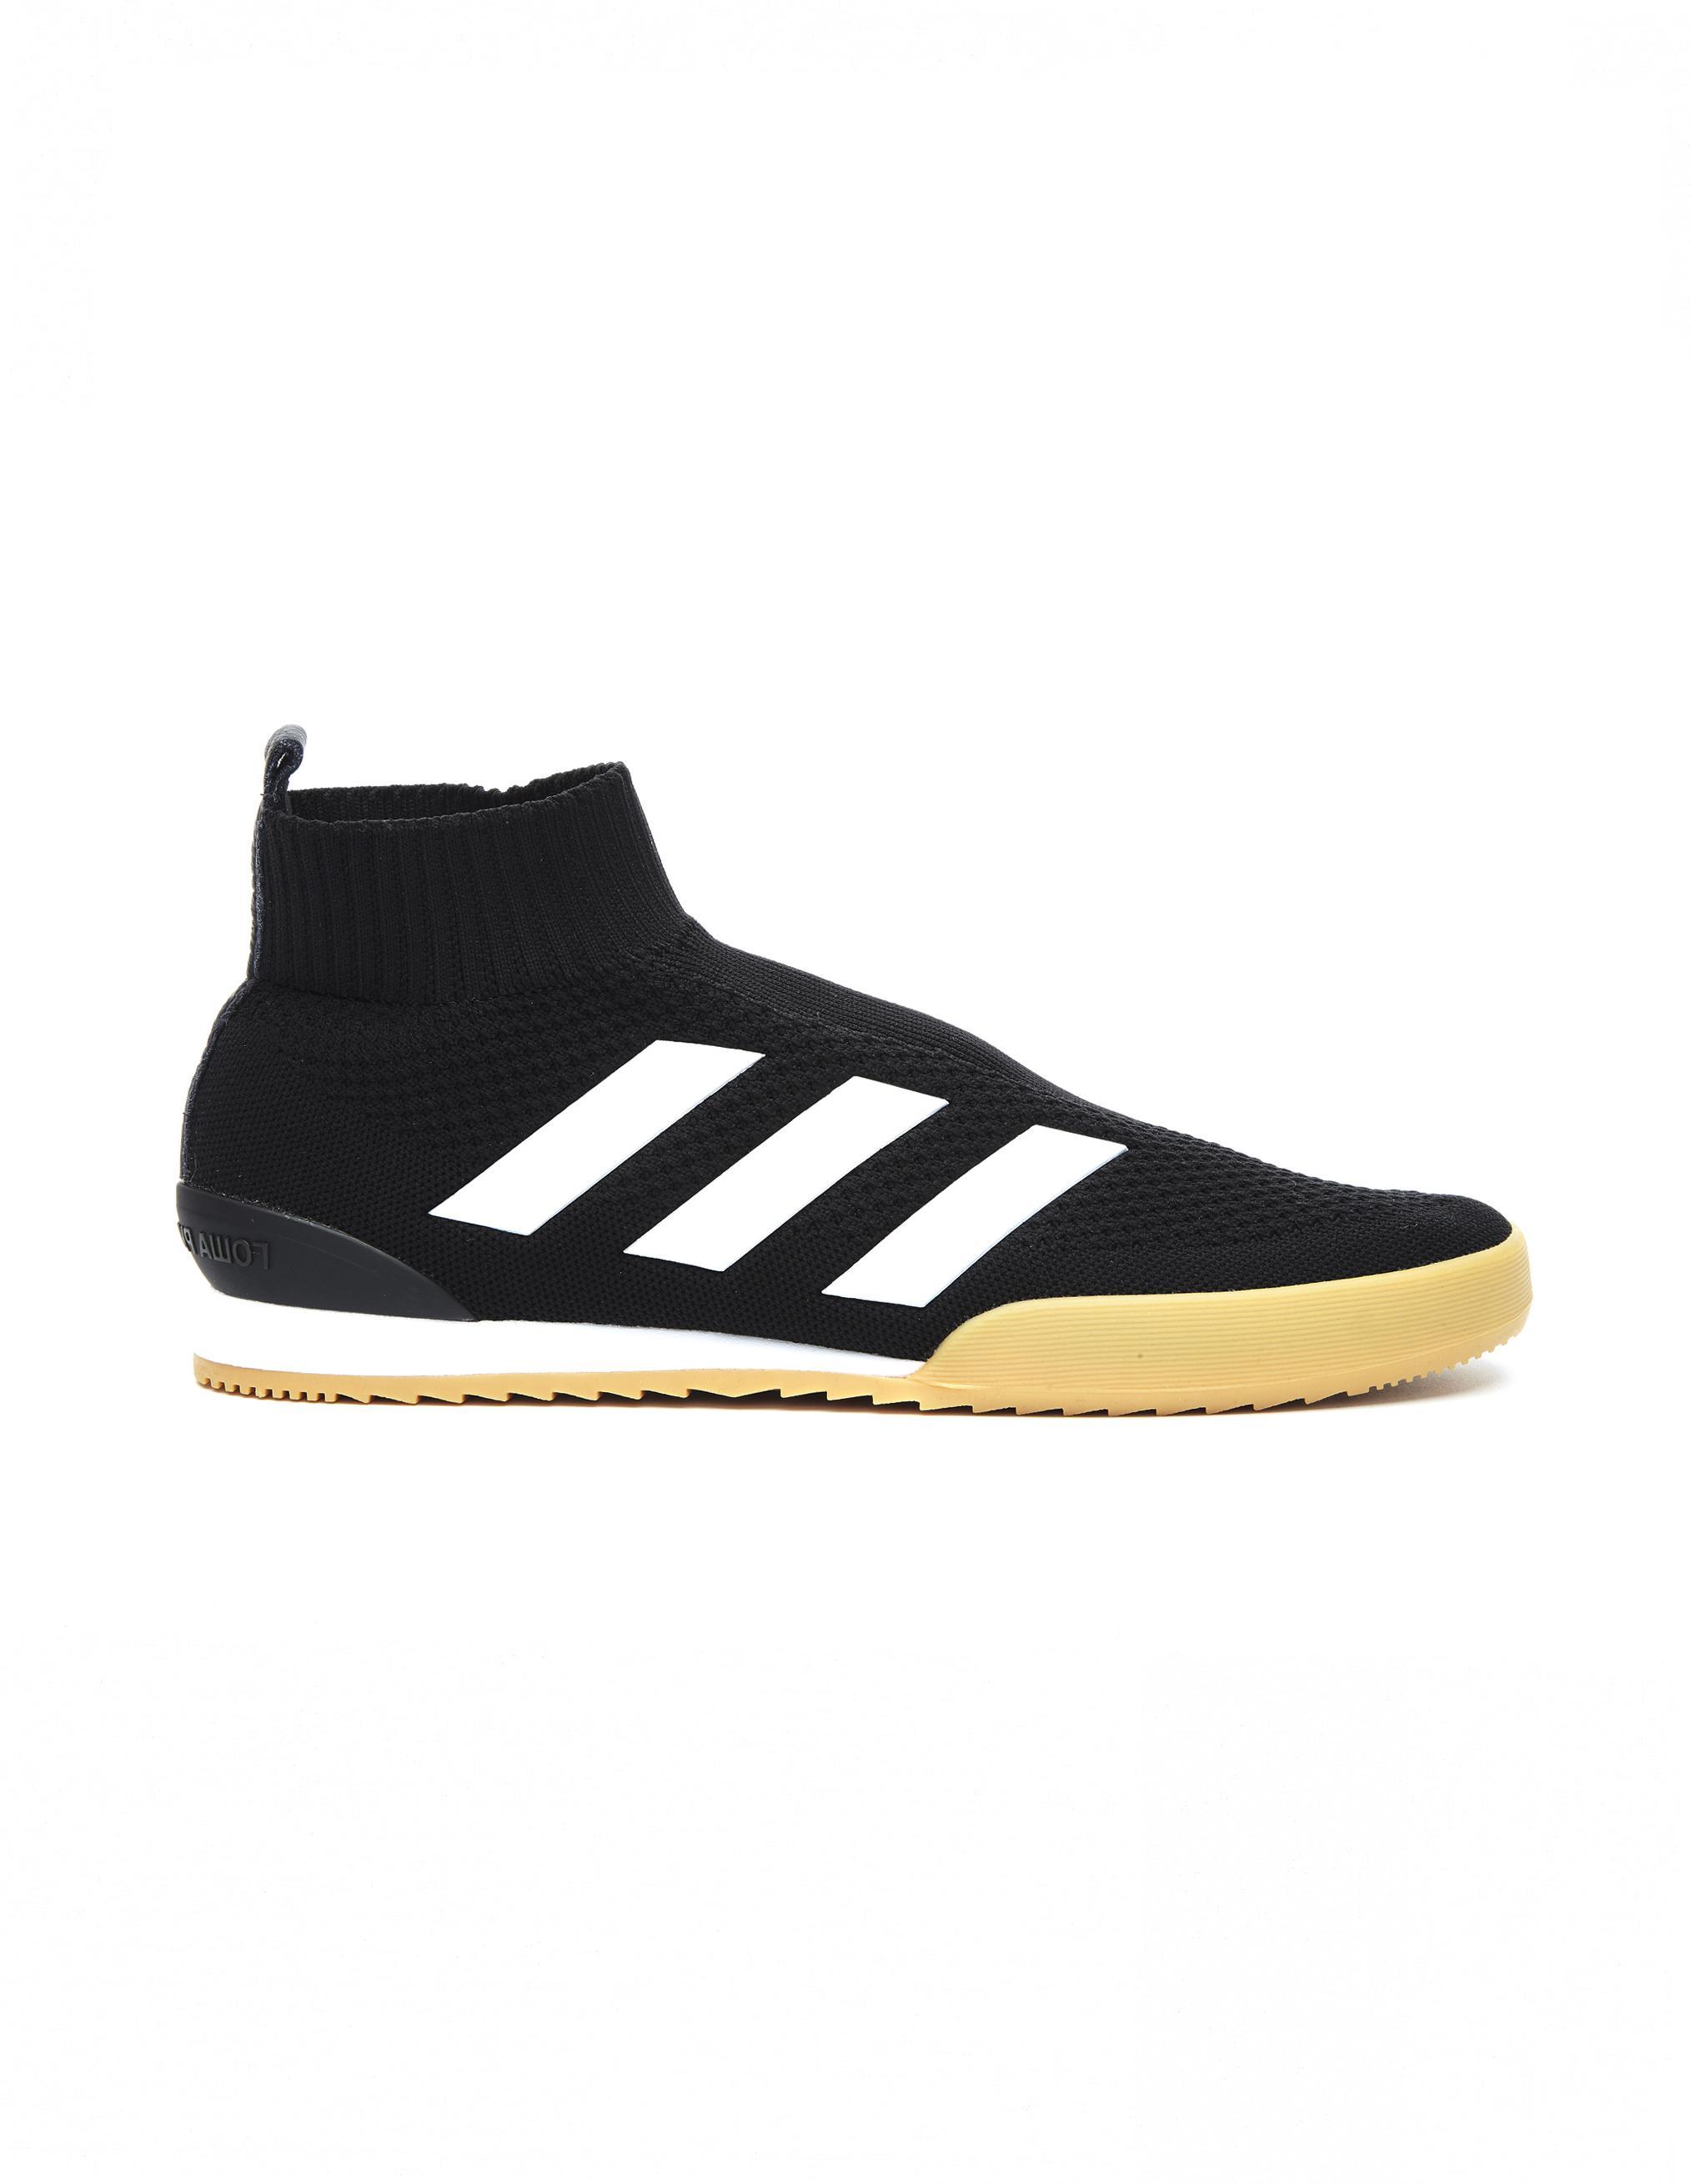 low priced ec976 3f9b4 gosha-rubchinskiy-Black-Adidas-Ace-16-Super-Sneakers.jpeg